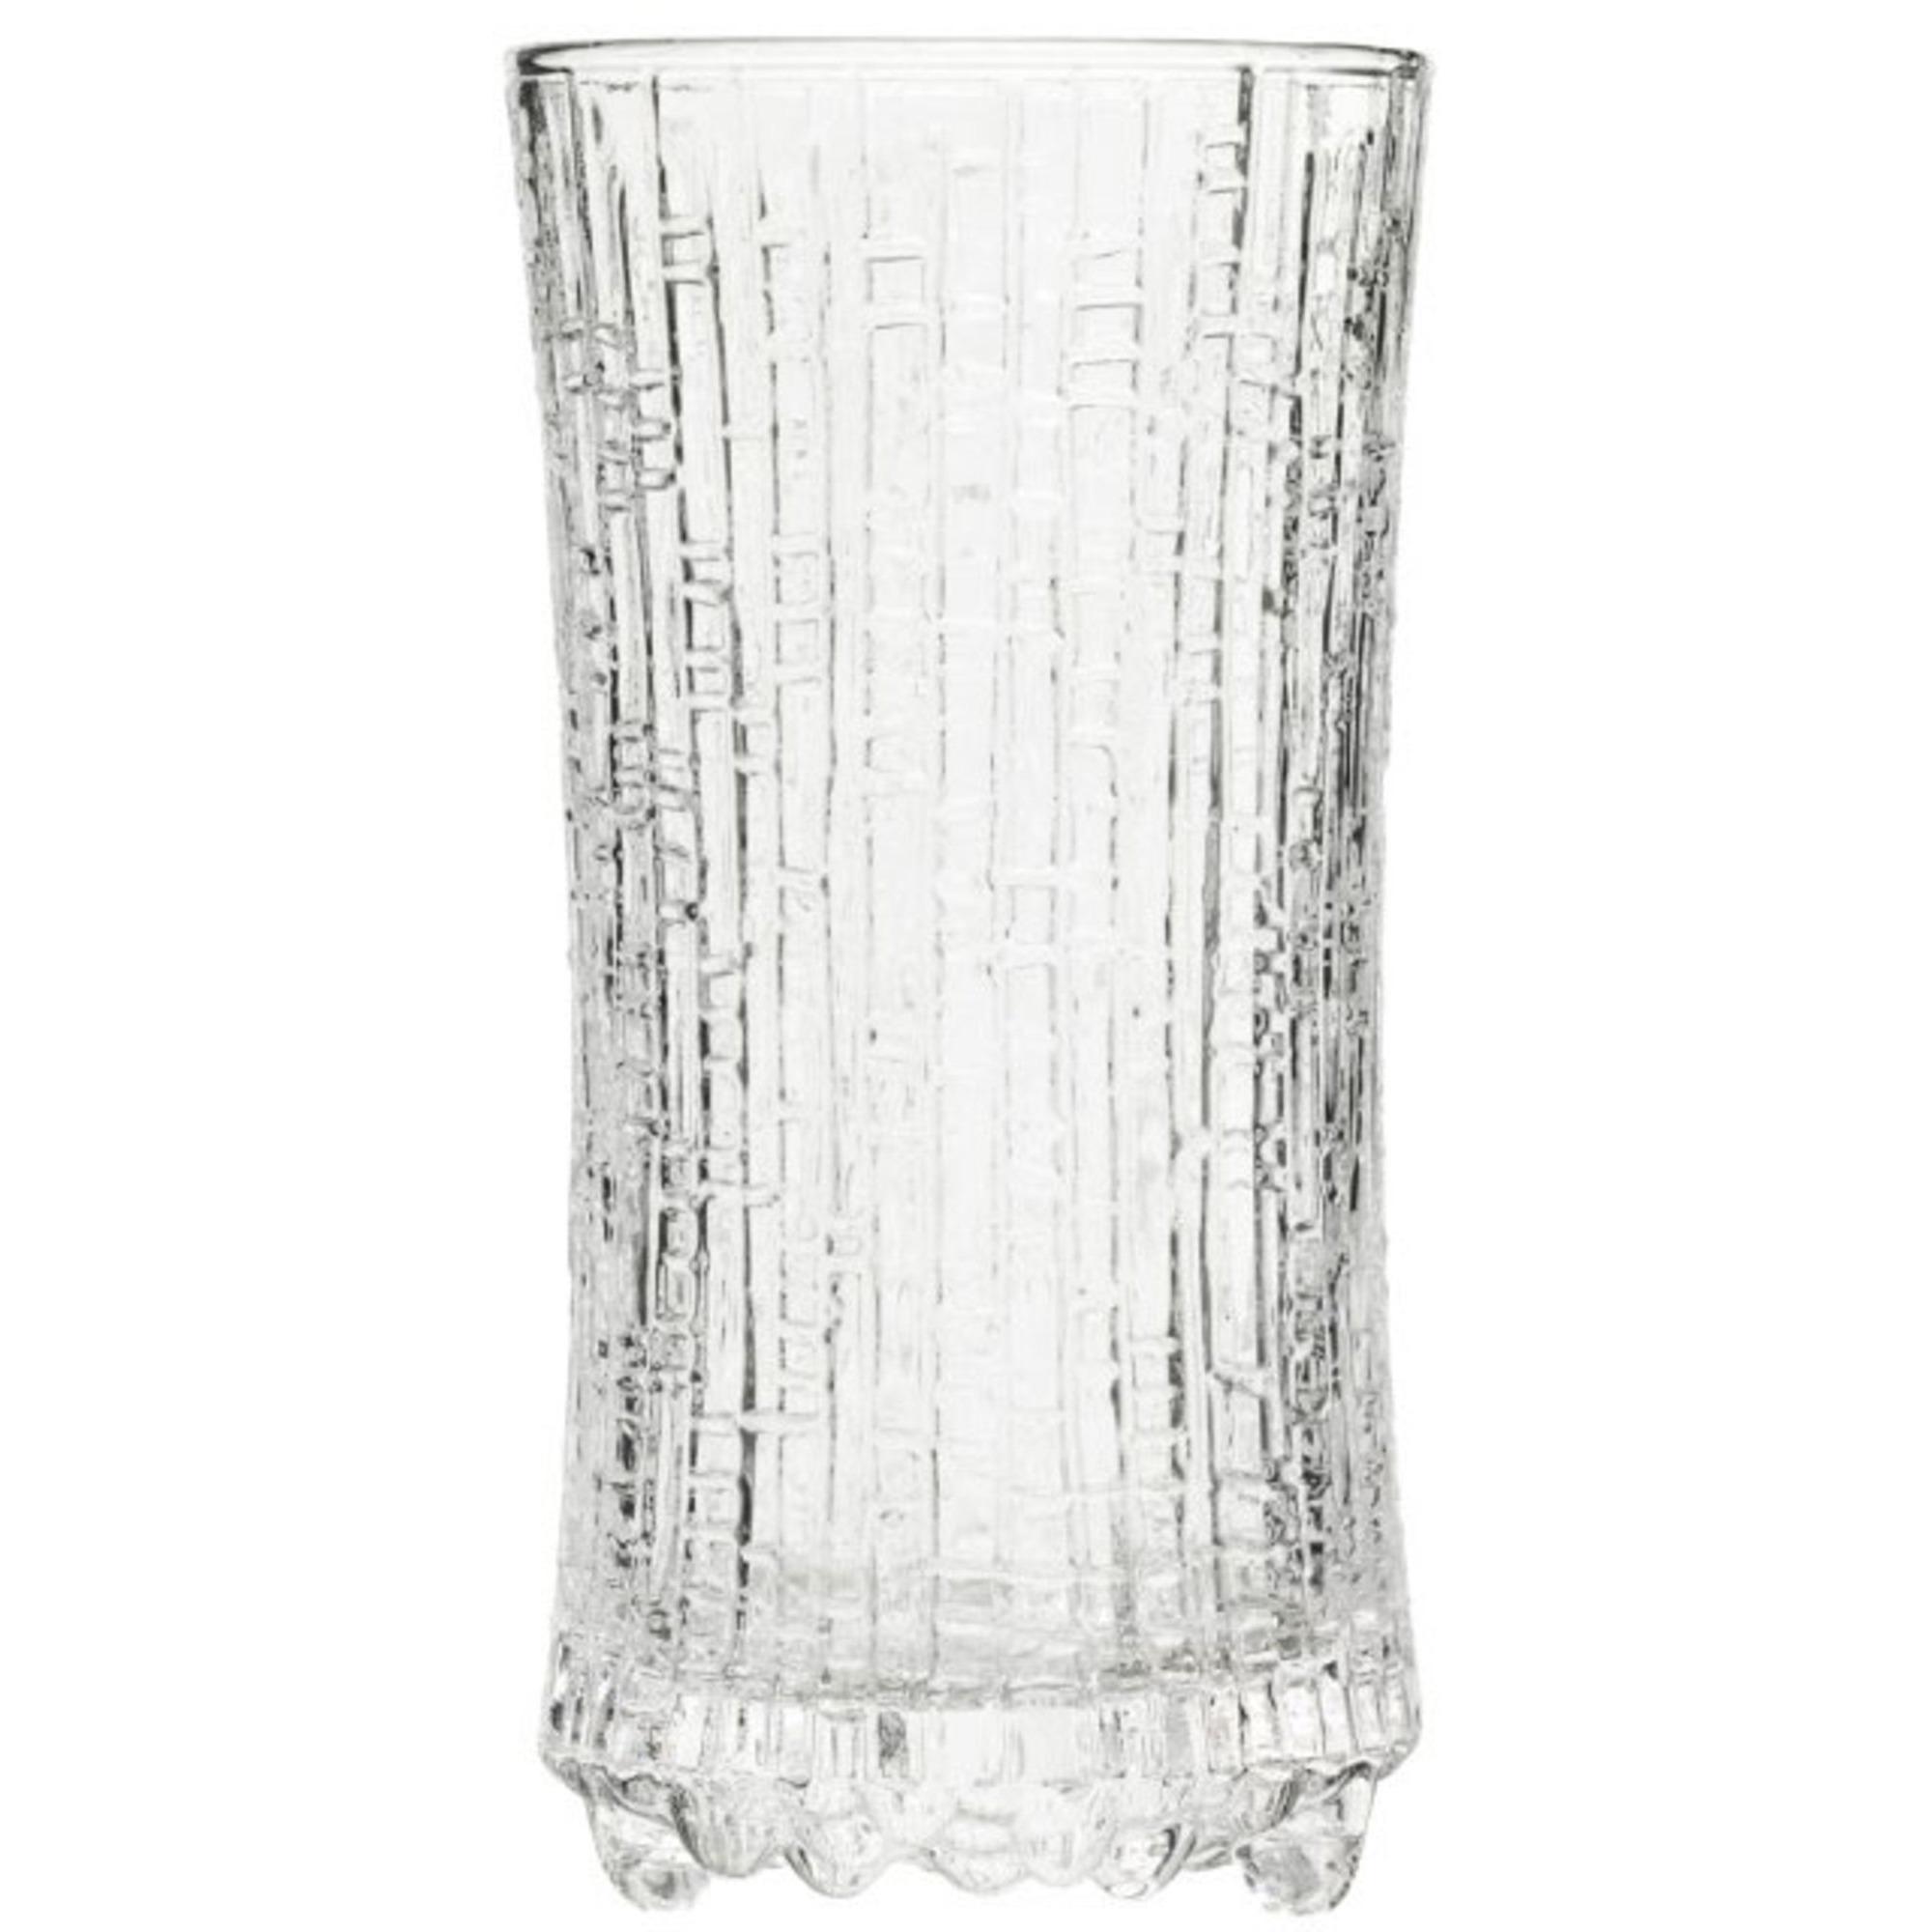 Iittala Ultima Thule glas till mousserende vin 18 cl.